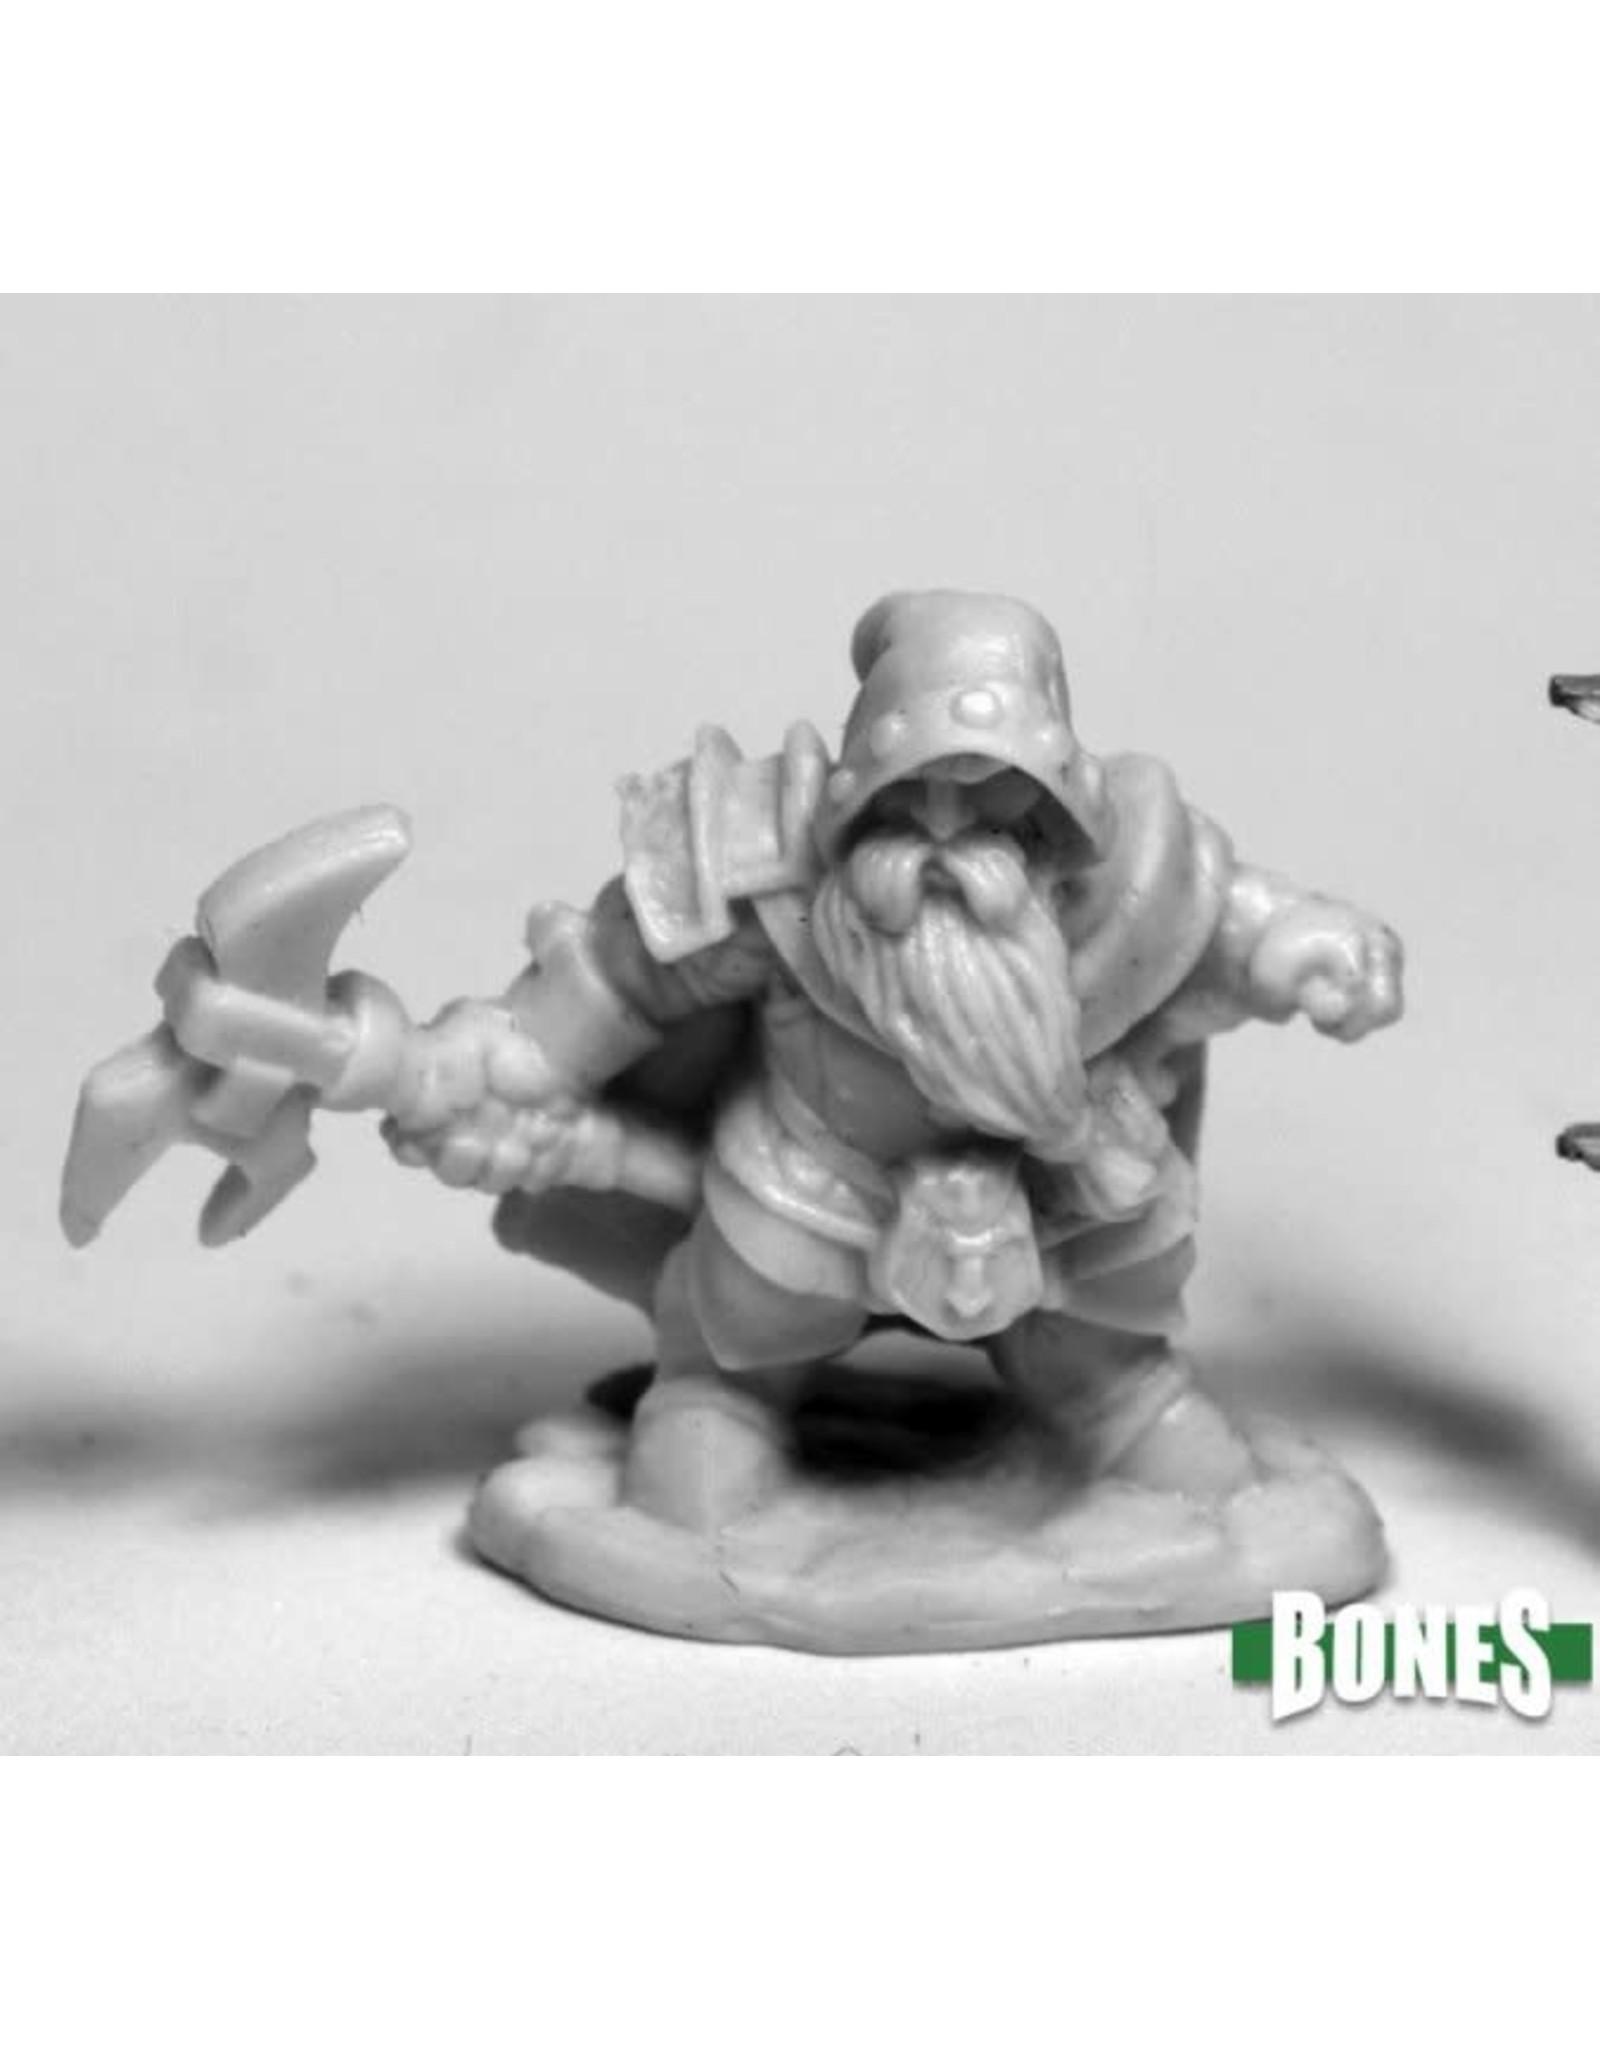 Reaper Miniatures Bones Durok, Dwarf Ranger